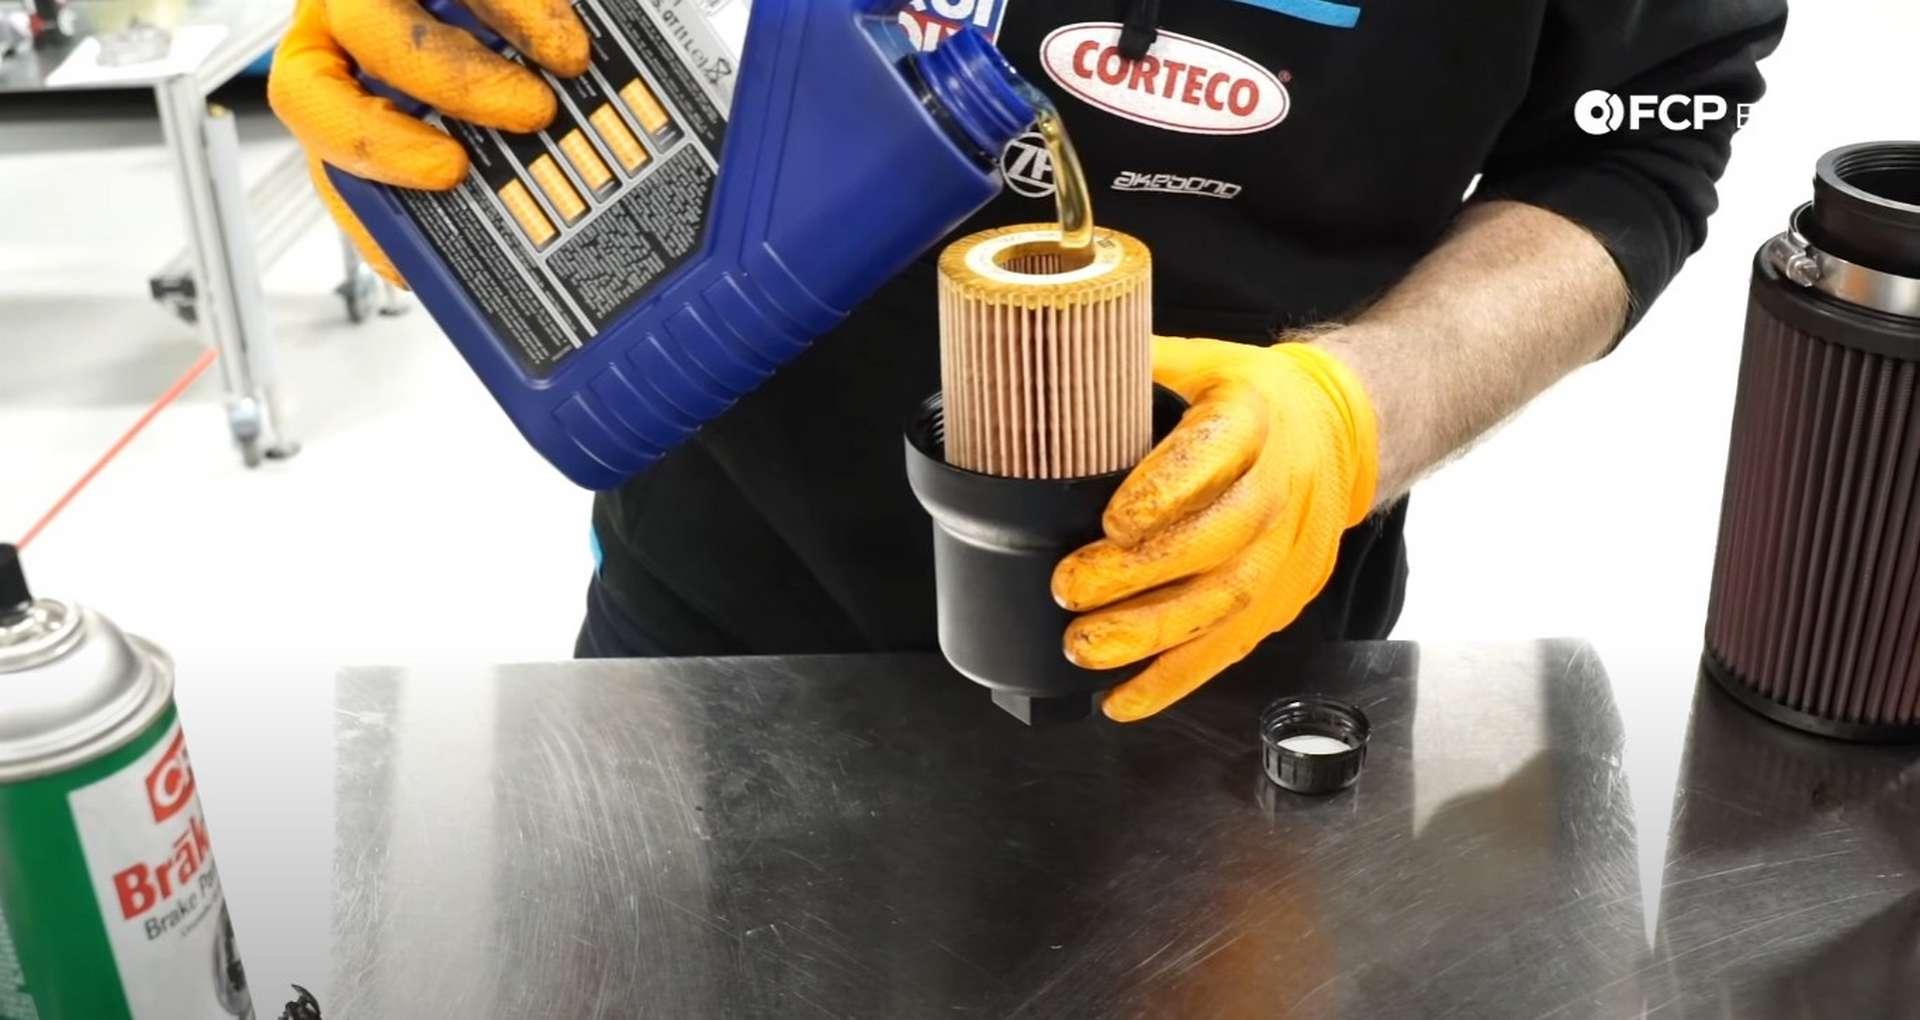 40-DIY-Mk5-GTI-Oil-FIlter-Housing_Refilling-Fluids